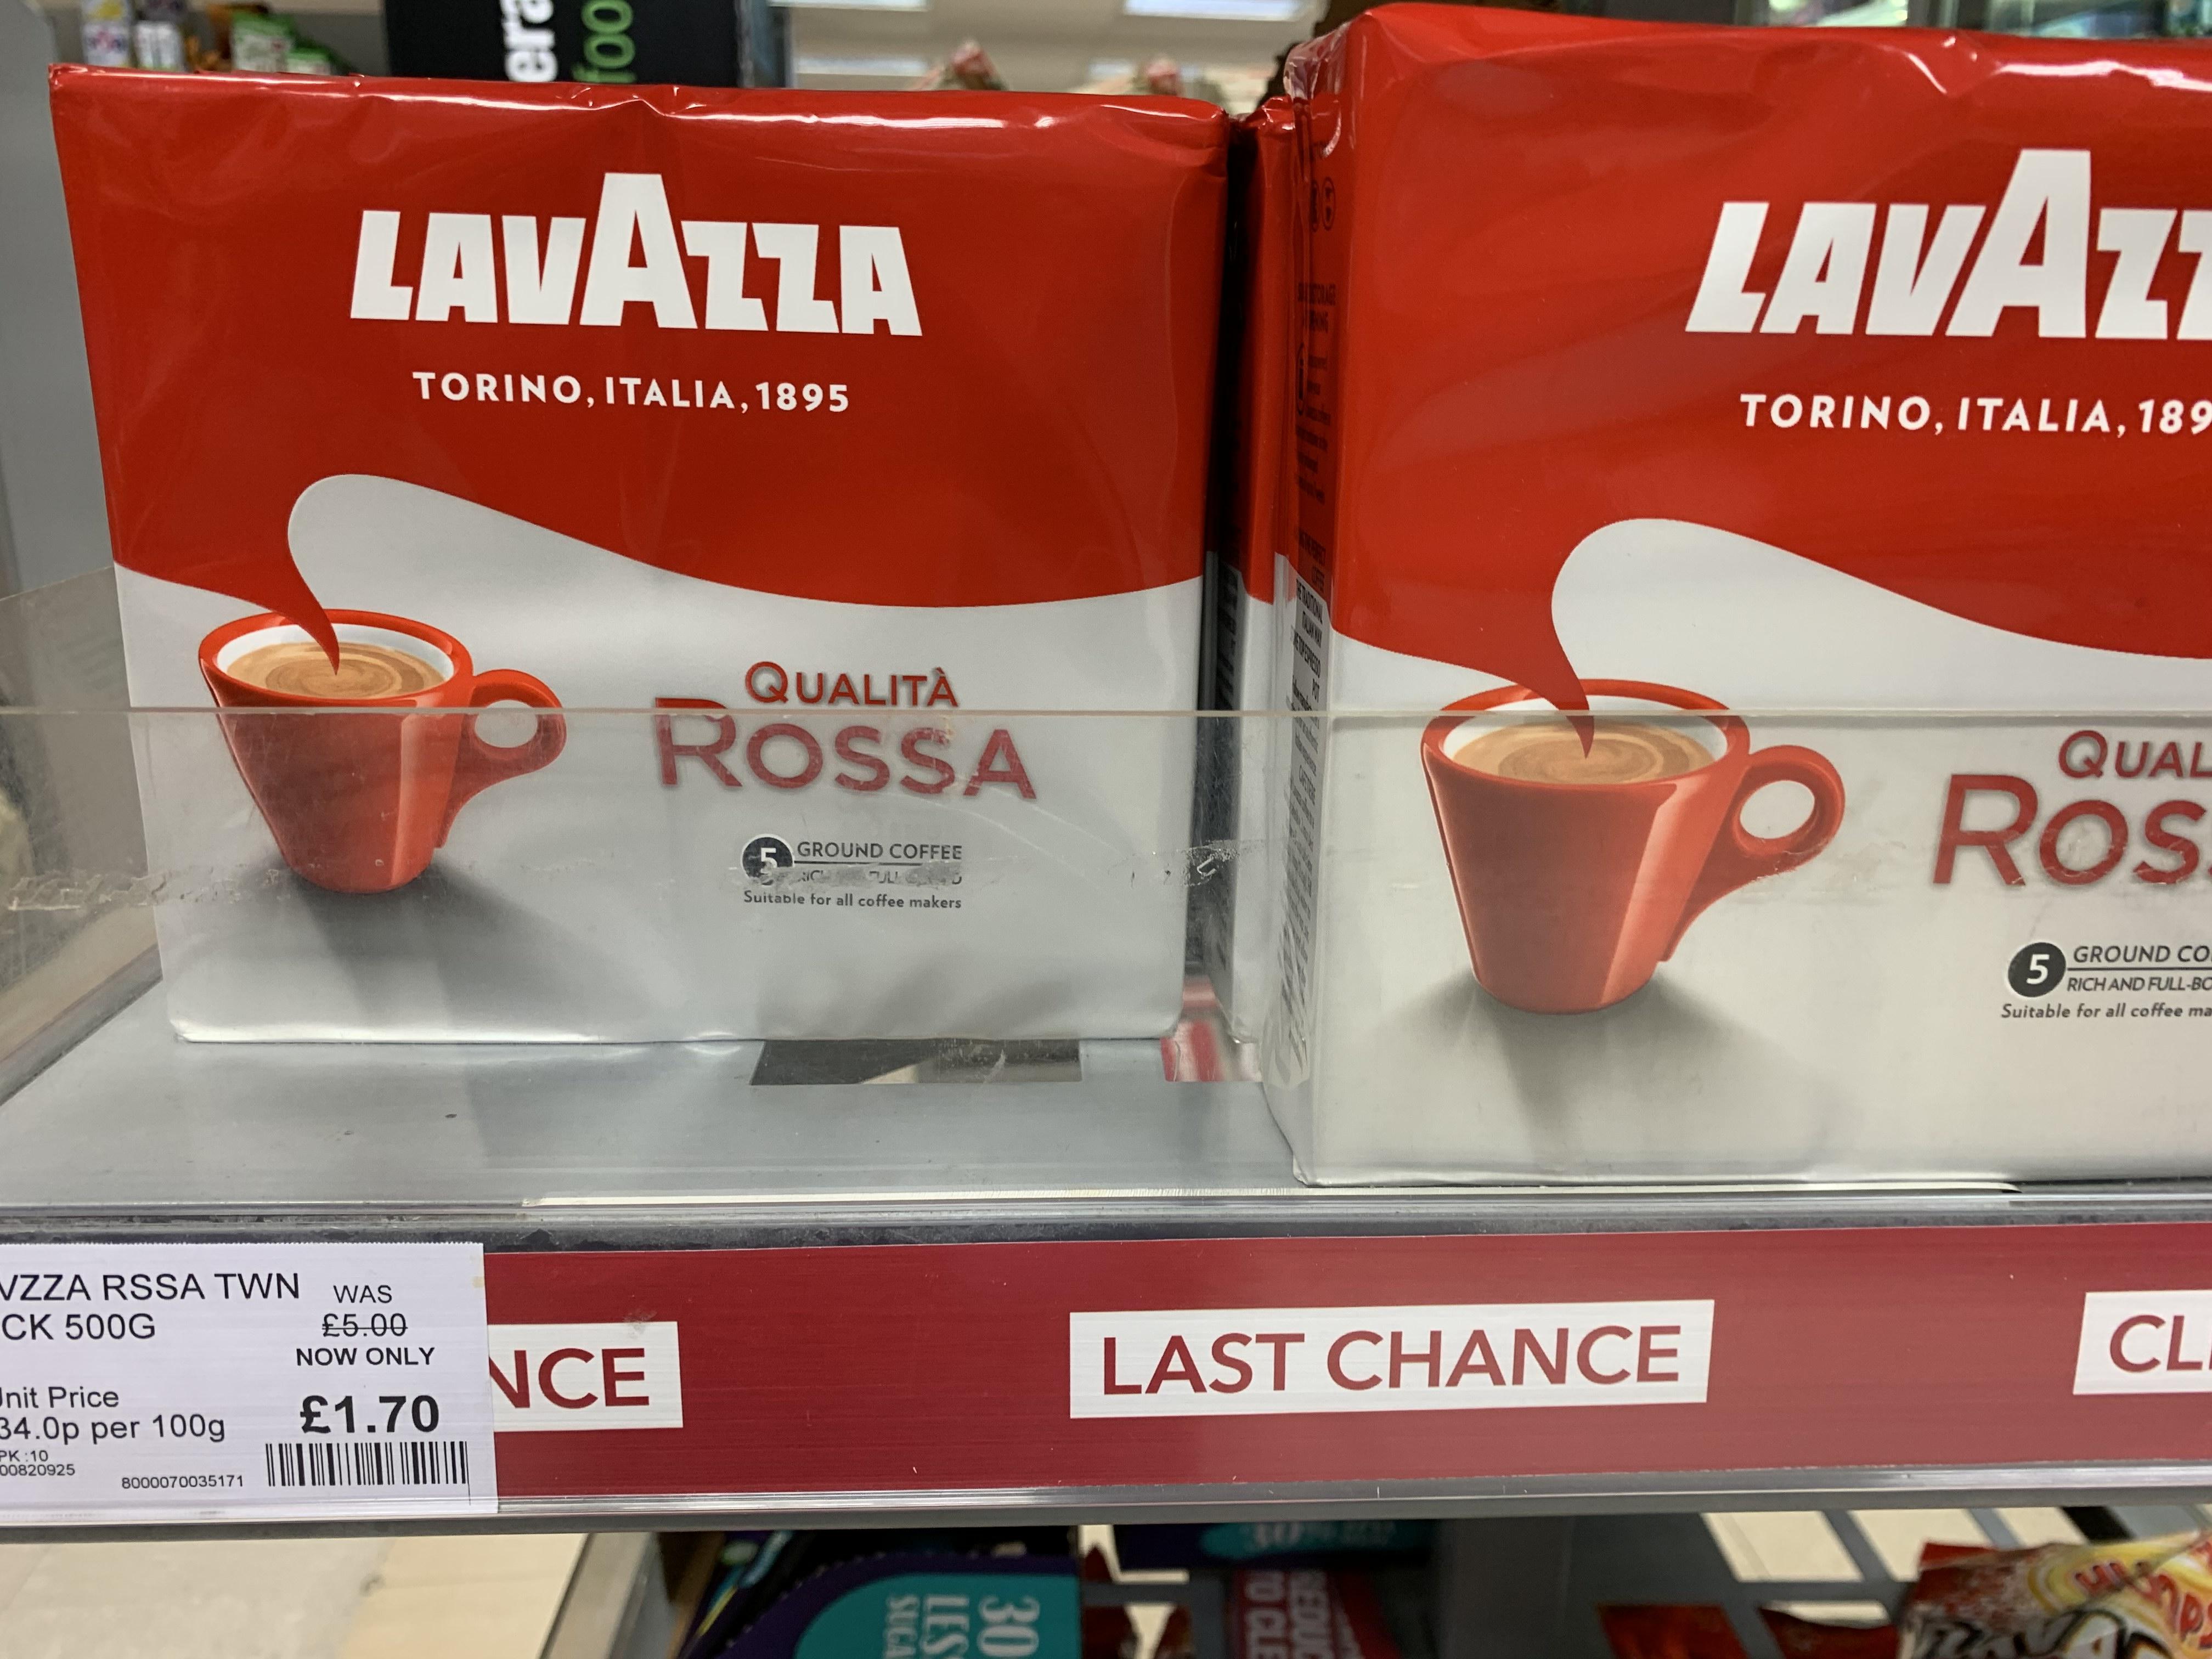 Lavazza Qualita Rossa Ground 500g £1.70 in Co-Op